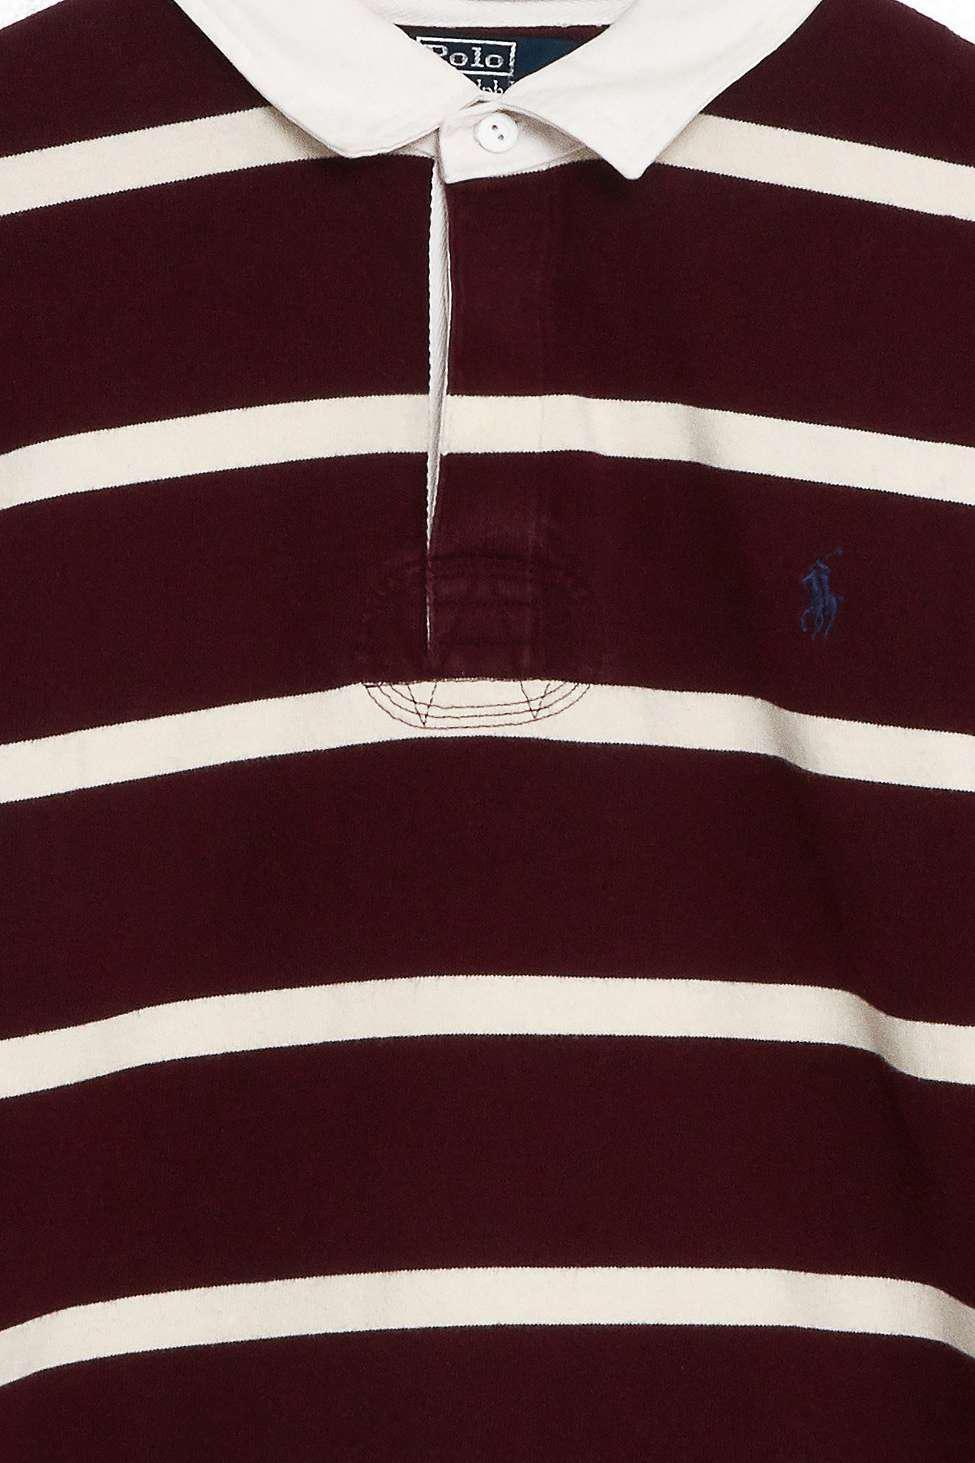 f19f782d27ad Urban Renewal Vintage One-of-a-kind Ralph Lauren Burgundy Striped ...